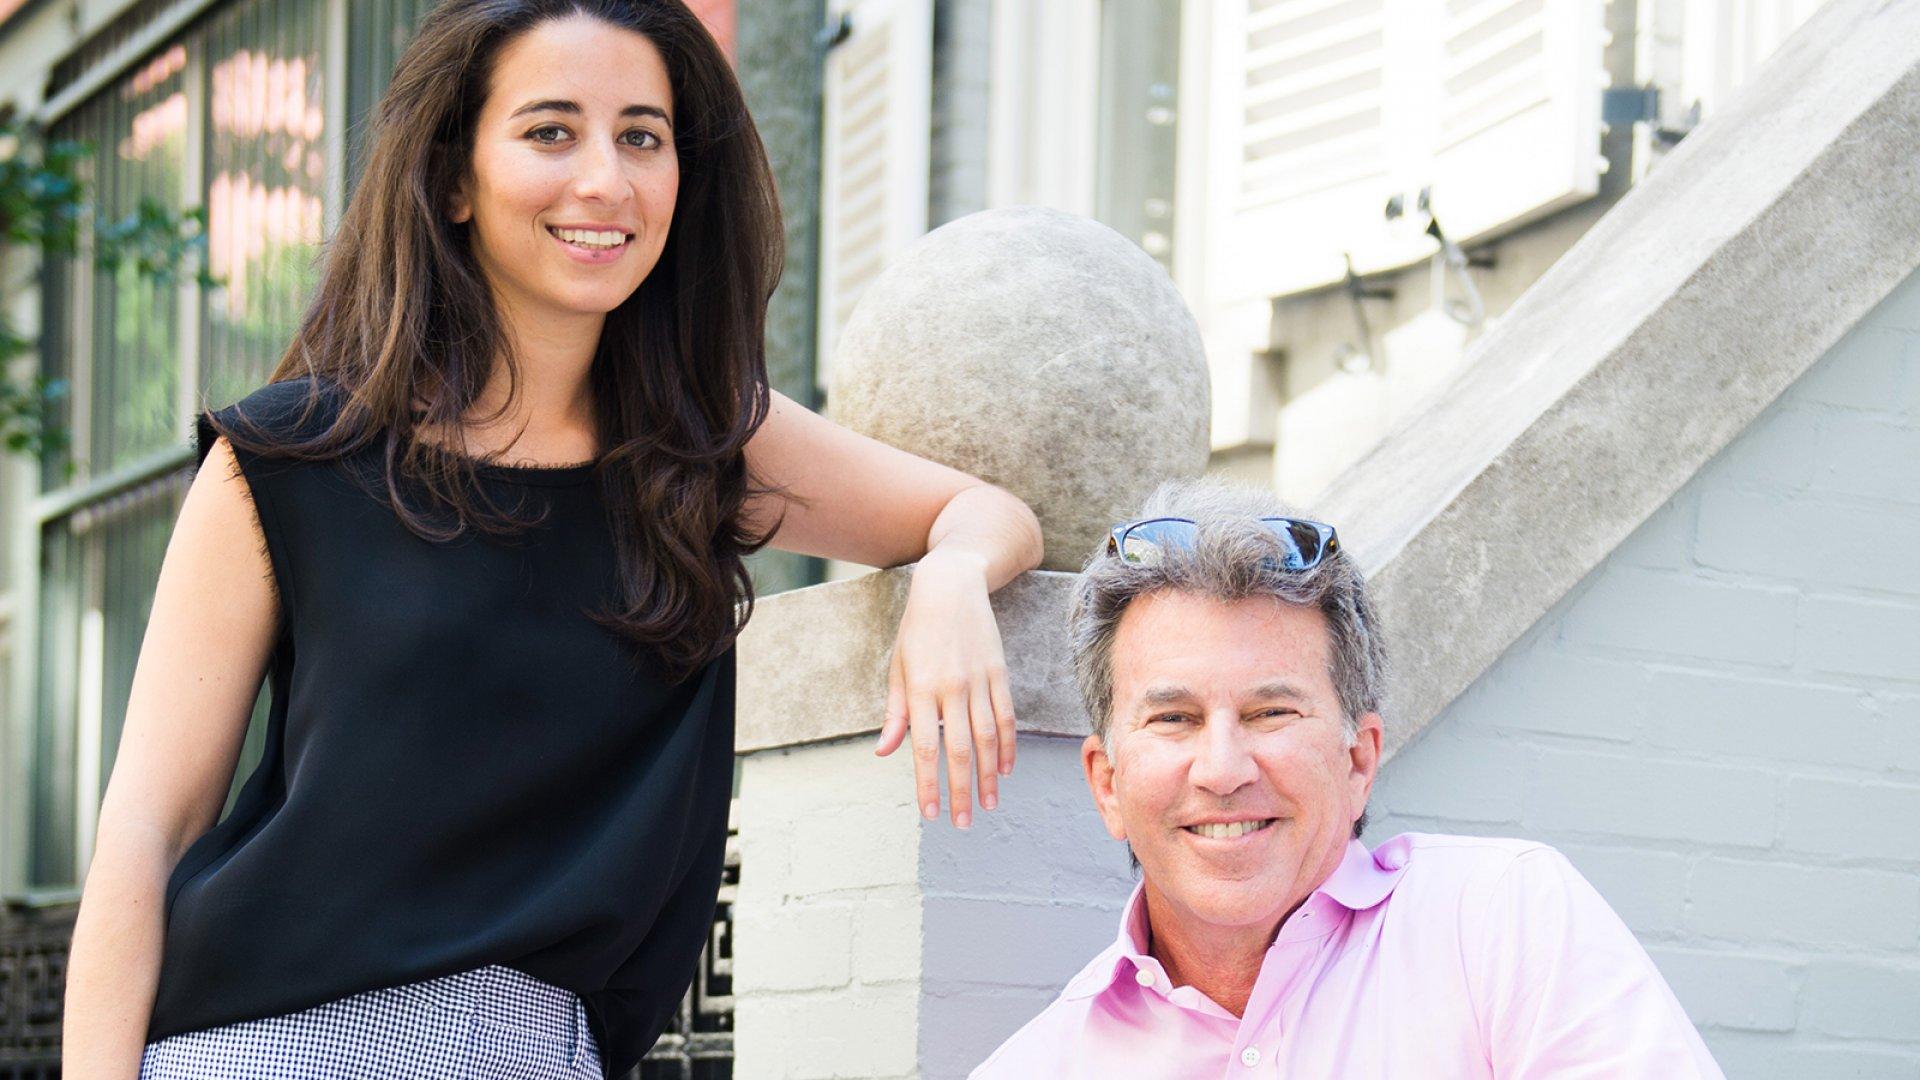 Sustain Natural's Meika and Jeffrey Hollender